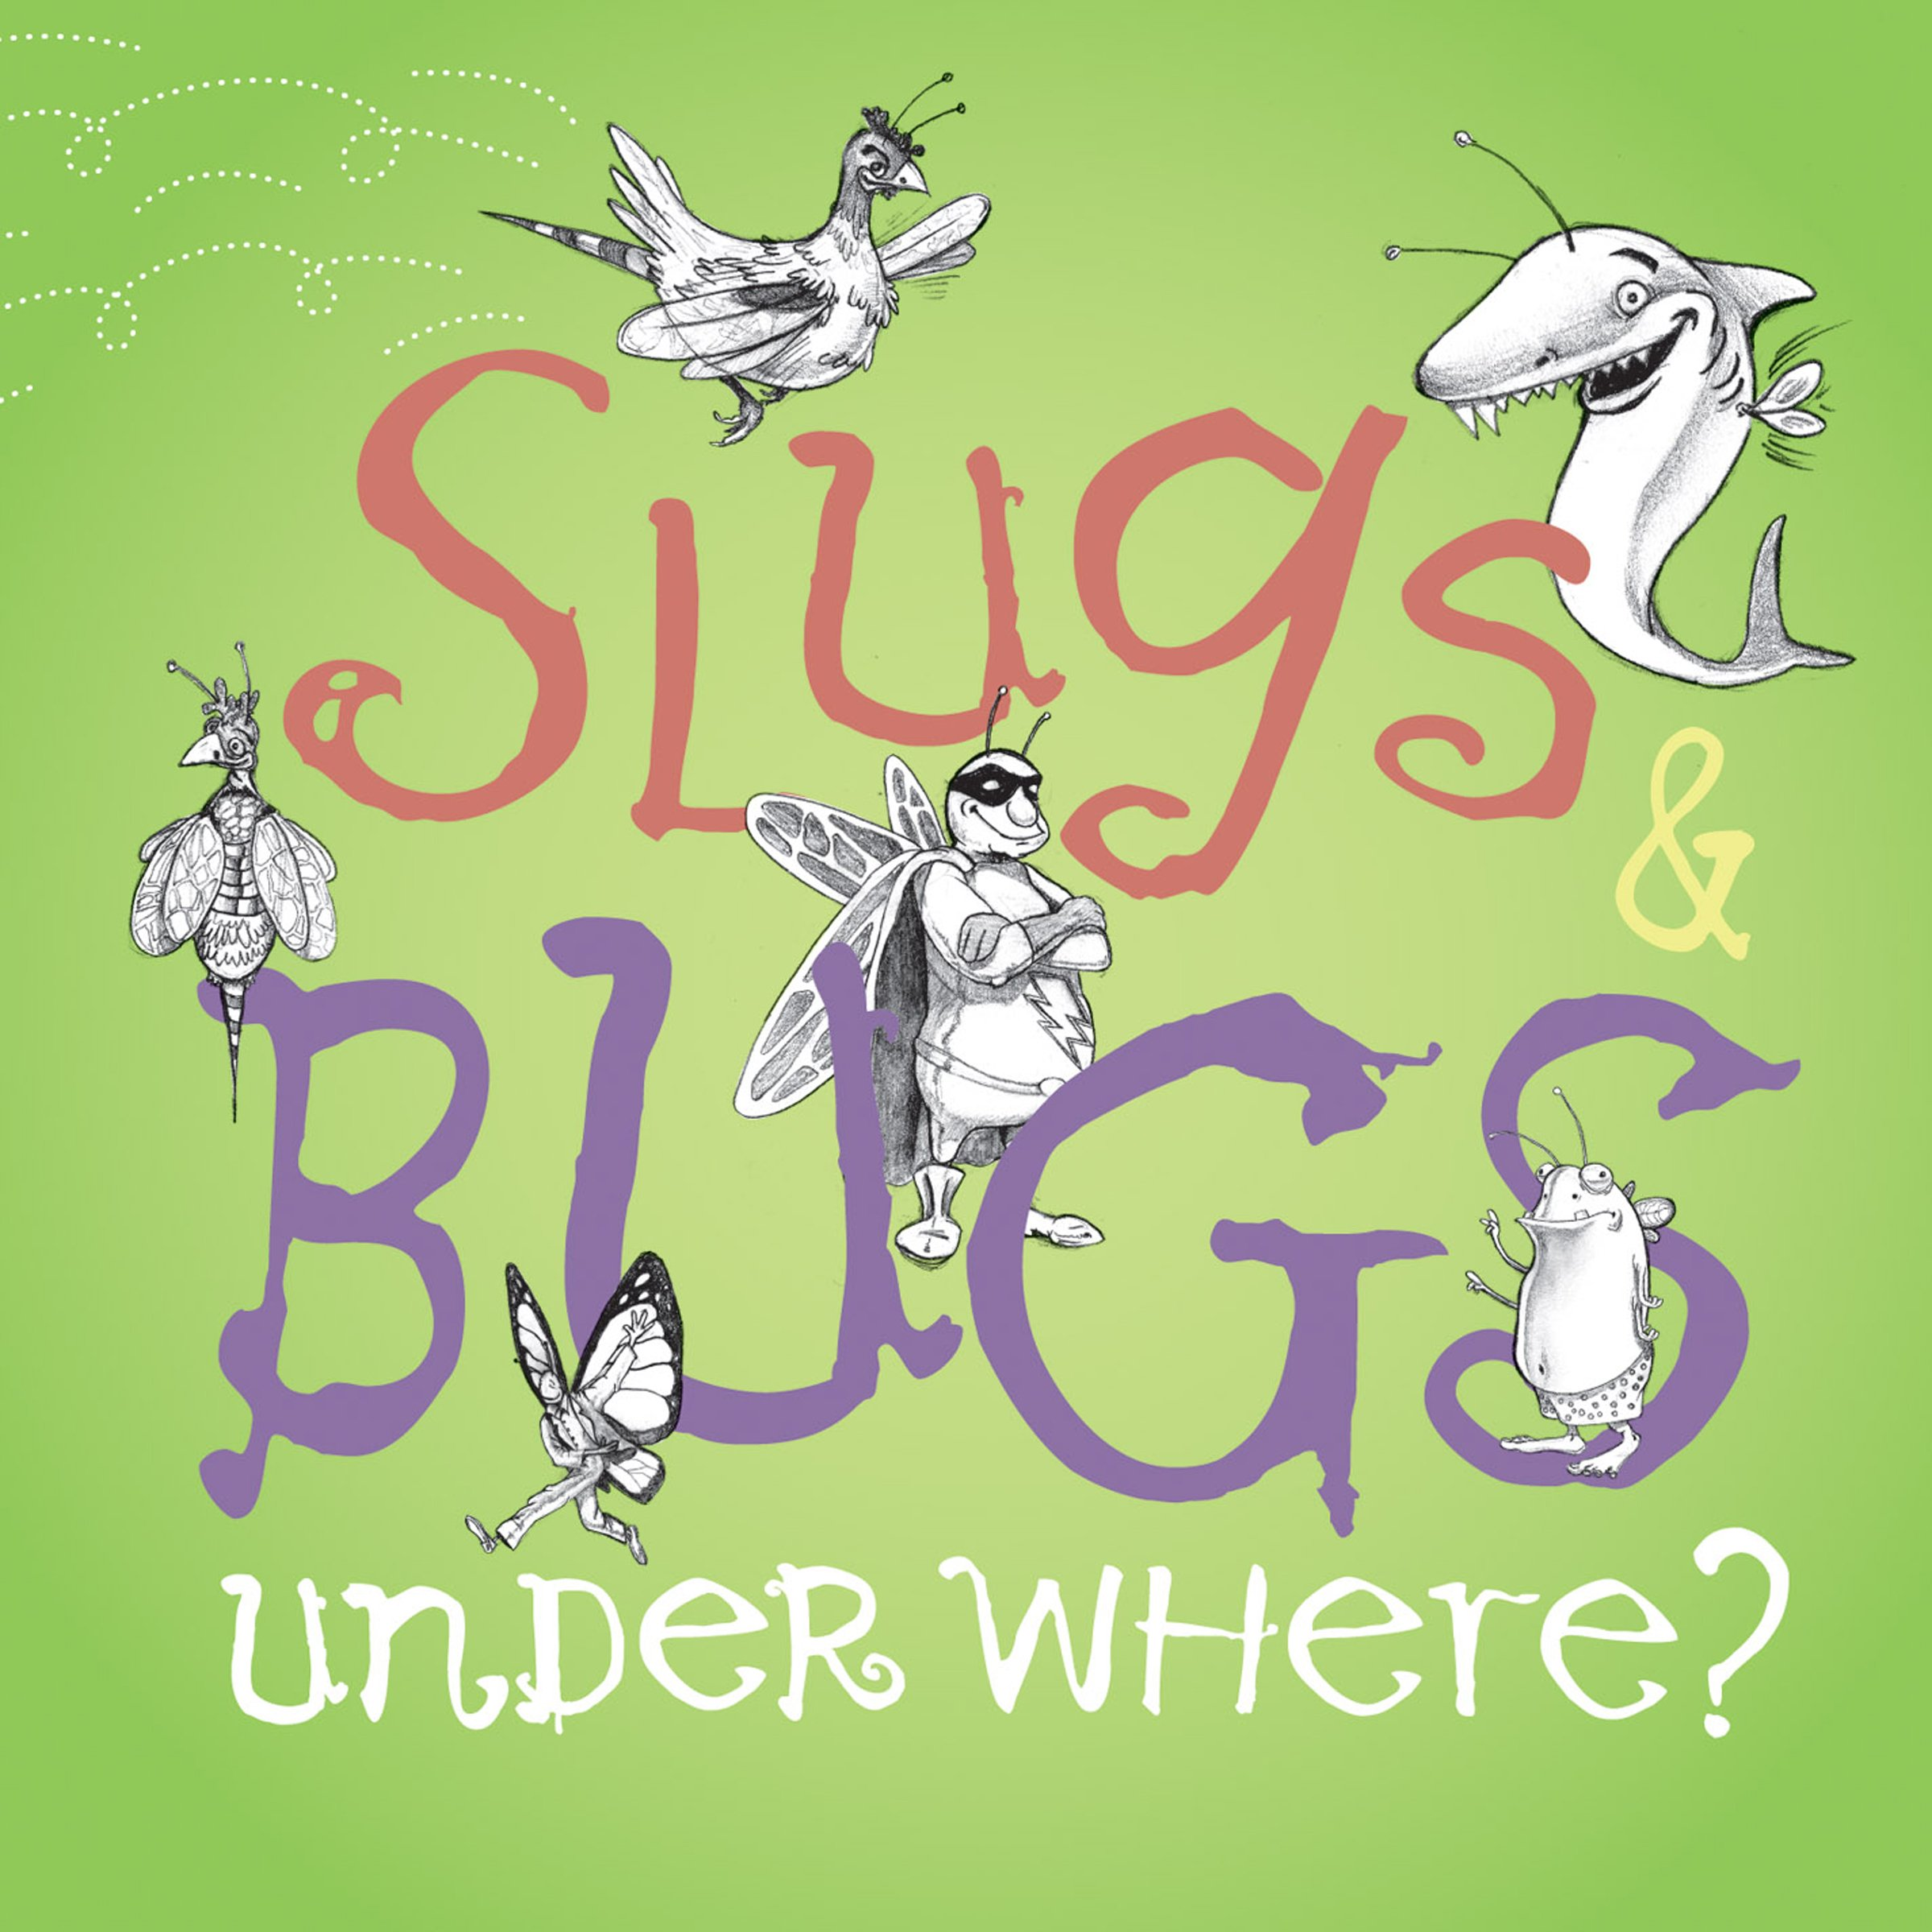 Slugs & Bugs & Under Where